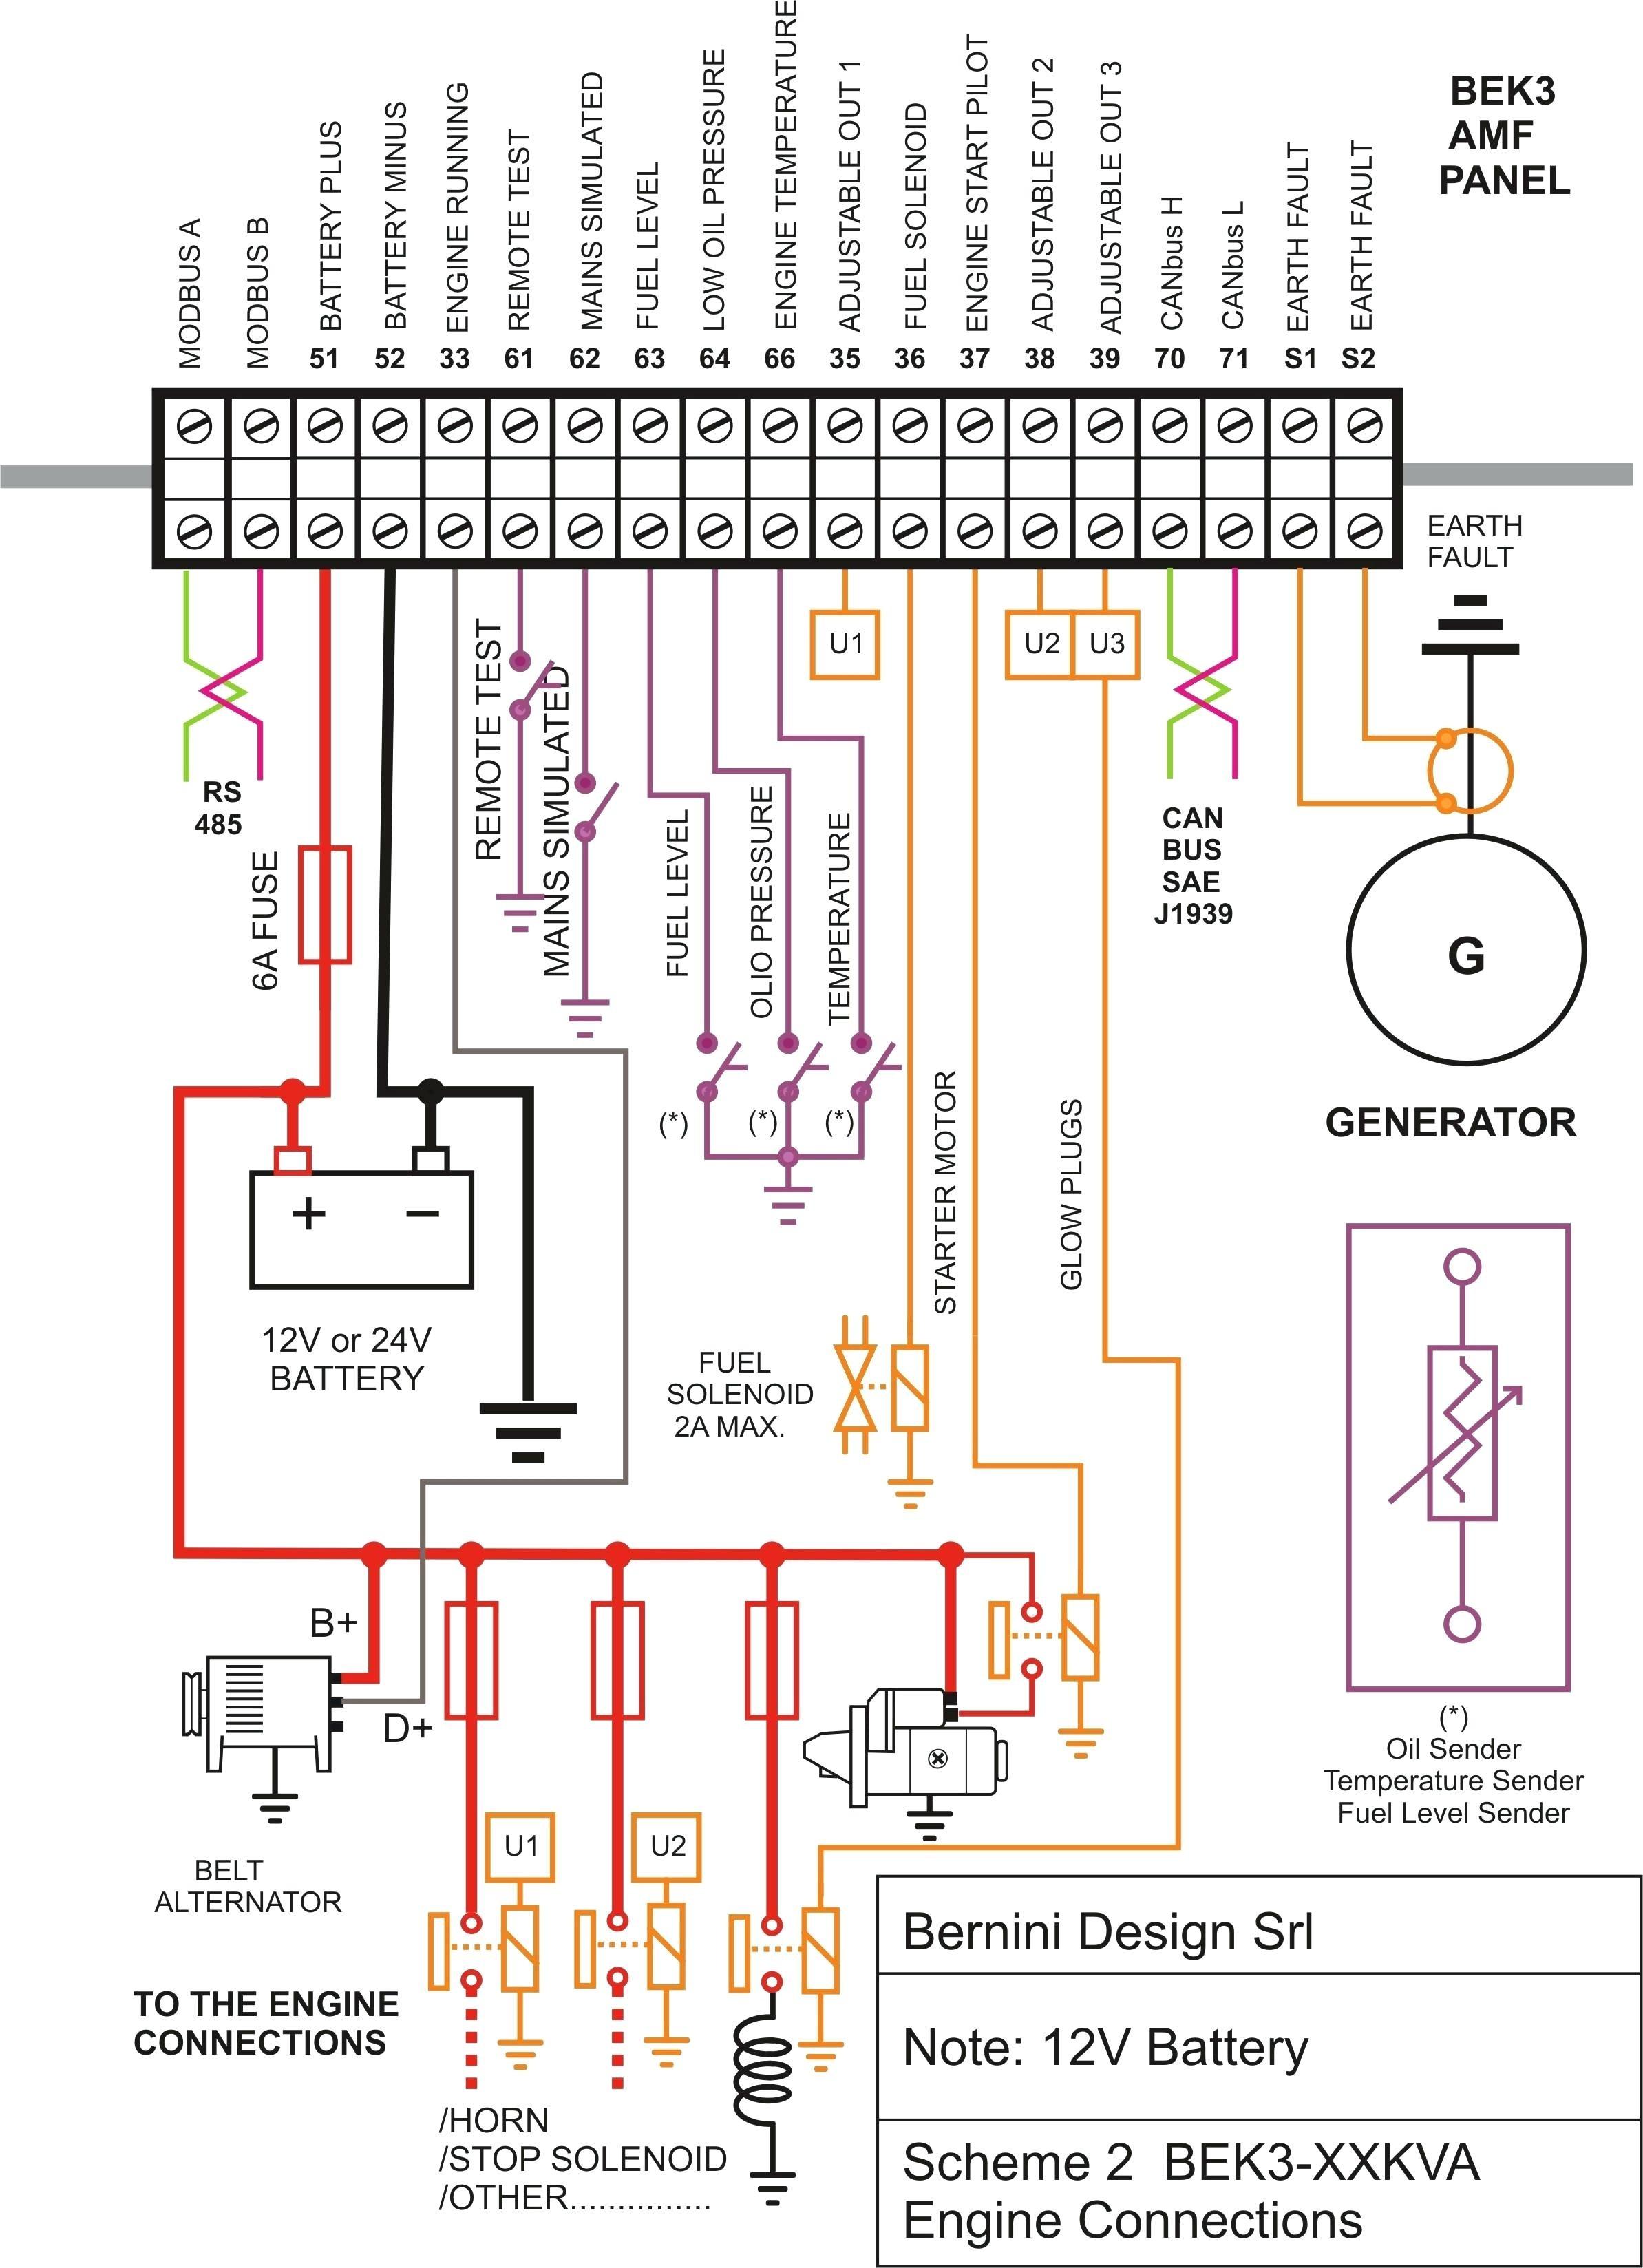 Taco Zone Valves Wiring Diagram Best Taco Zone Valve Wiring Diagram Gallery Everything You Need to Of Taco Zone Valves Wiring Diagram